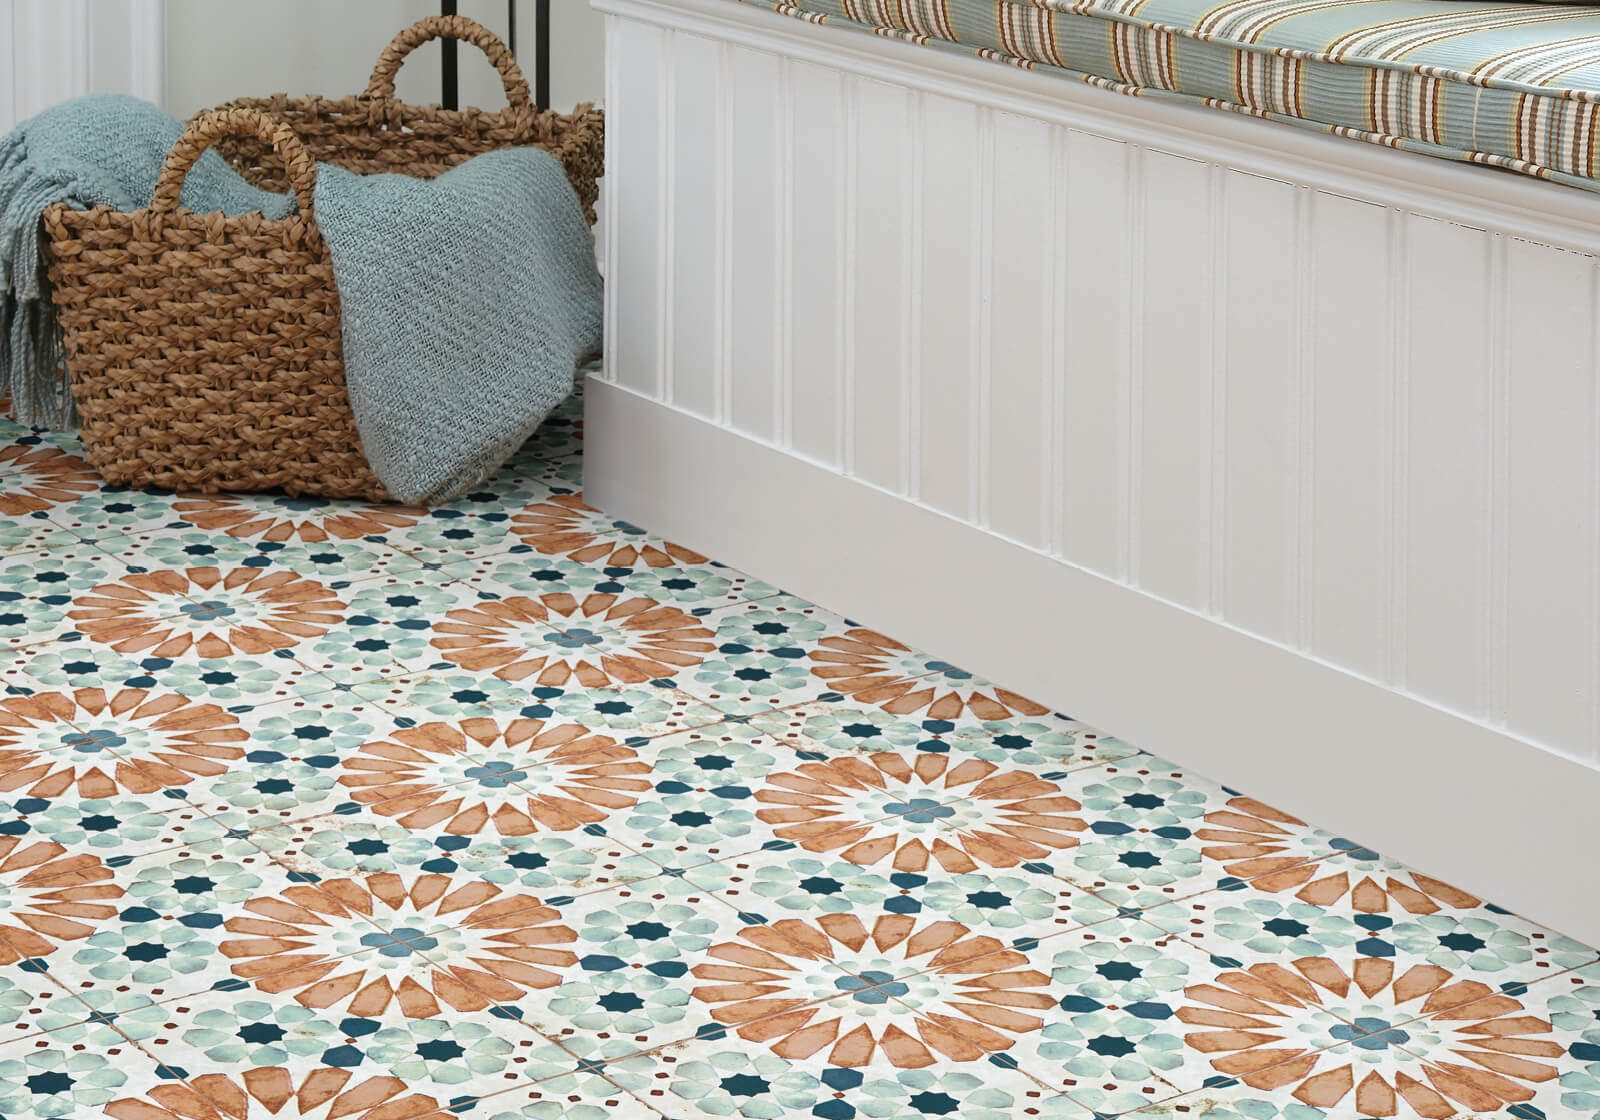 flower tile   Haley's Flooring & Interiors